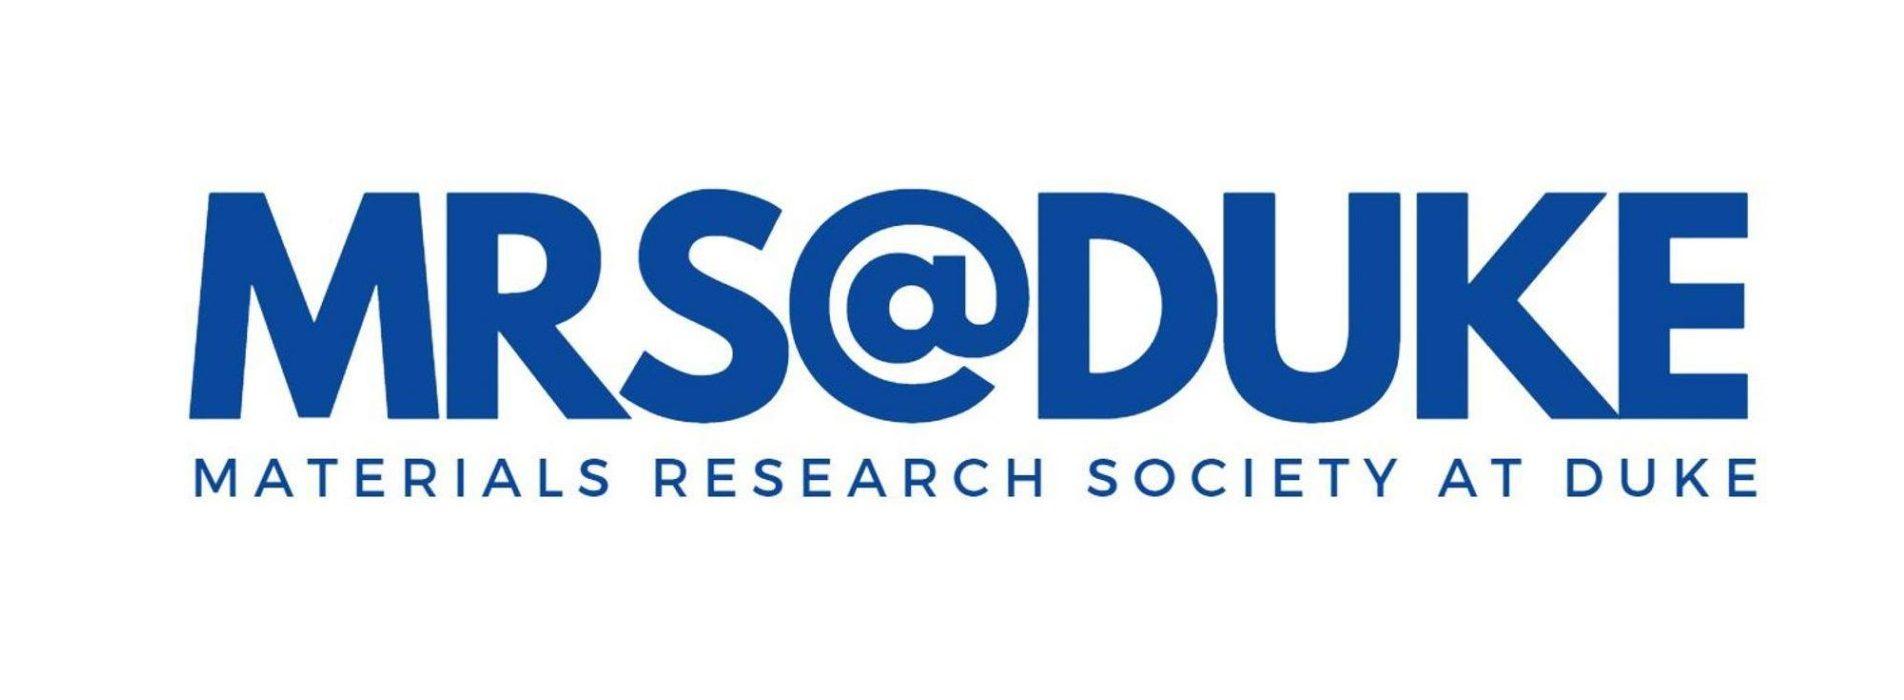 Materials Research Society at Duke